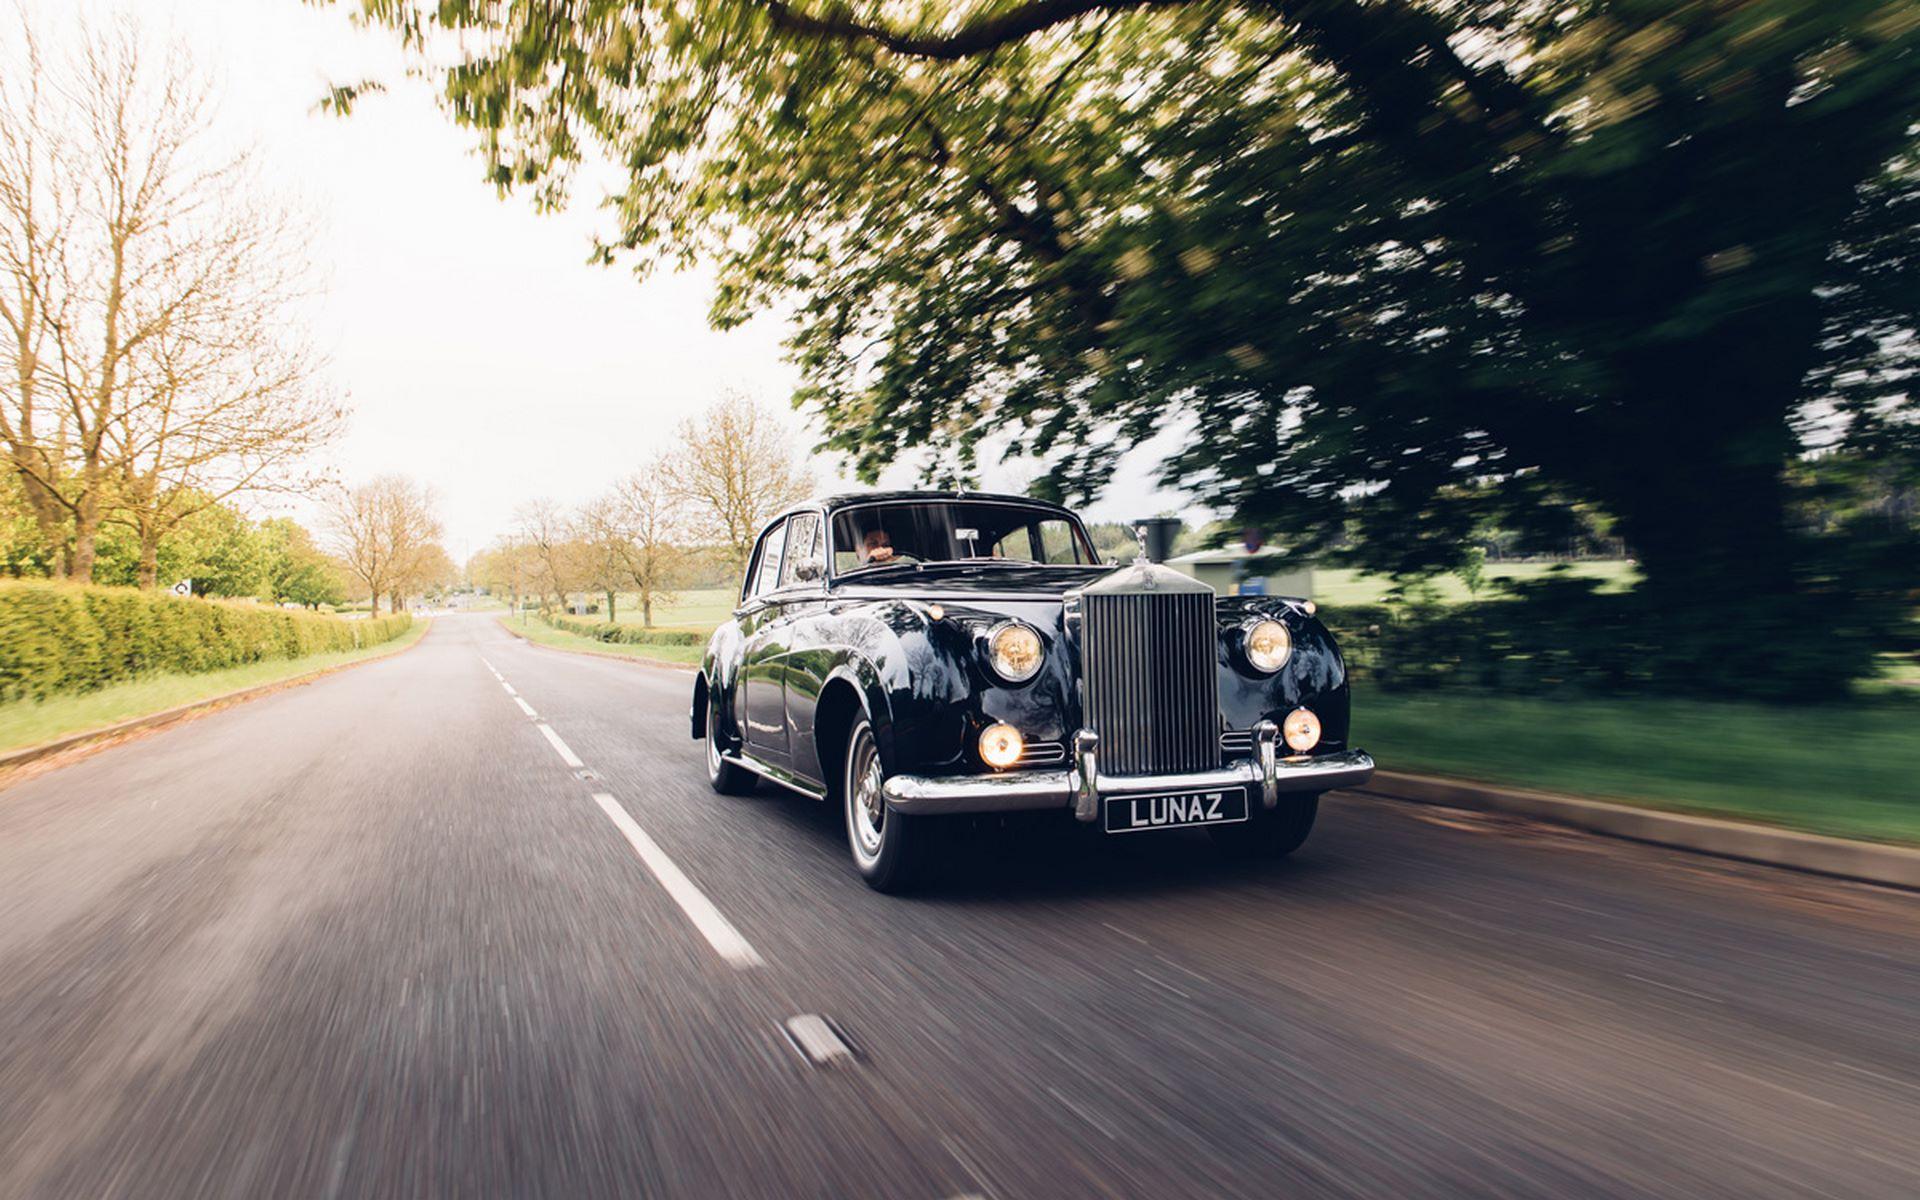 Electris-Rolls-Royce-Phantom-V-and-Silver-Cloud-by-Lunaz-7